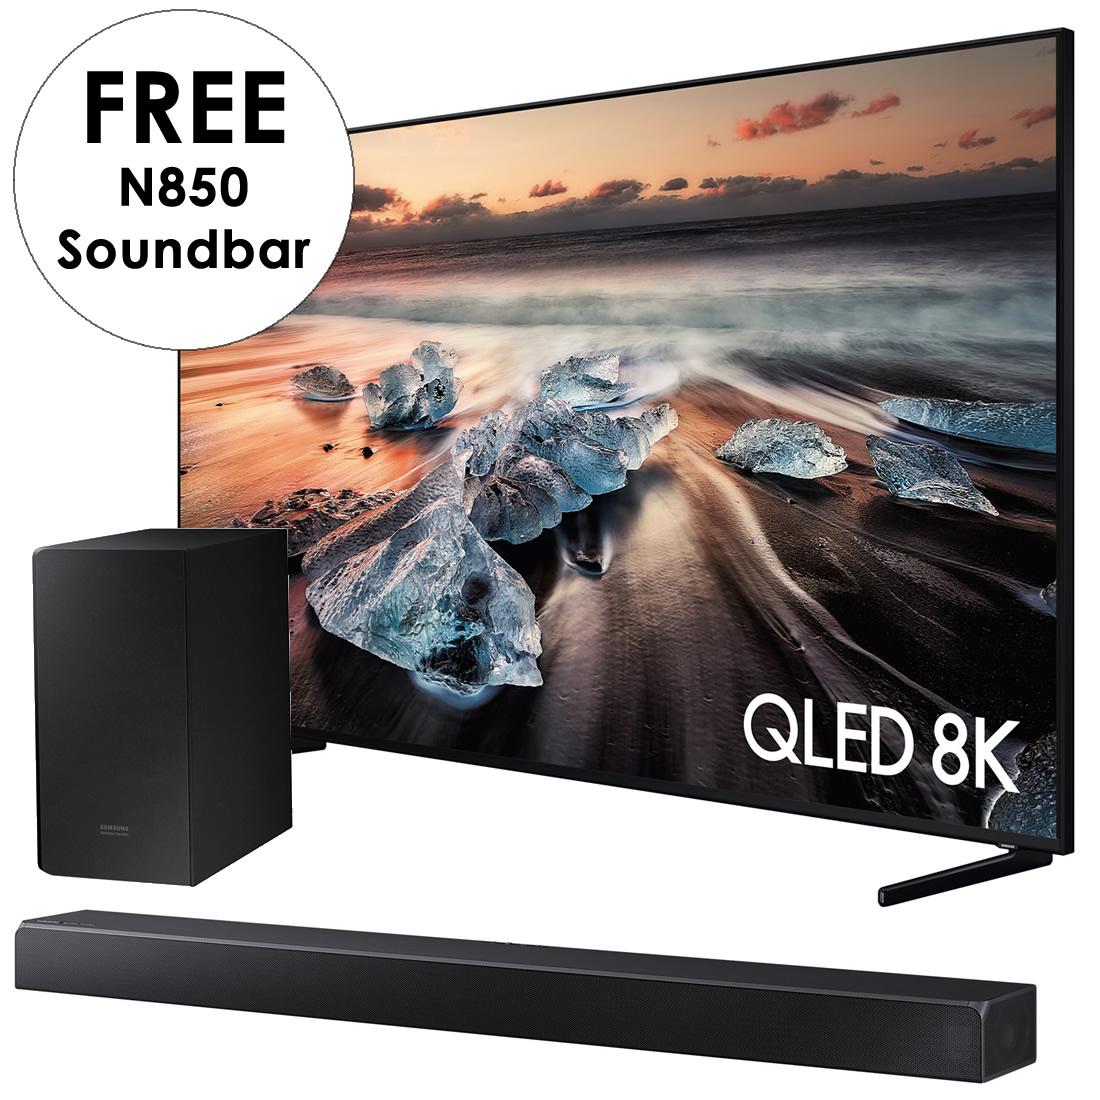 Image of 85inch QLED UHD 8K HDR3000 SMART TV Twin Tuner TVPlus